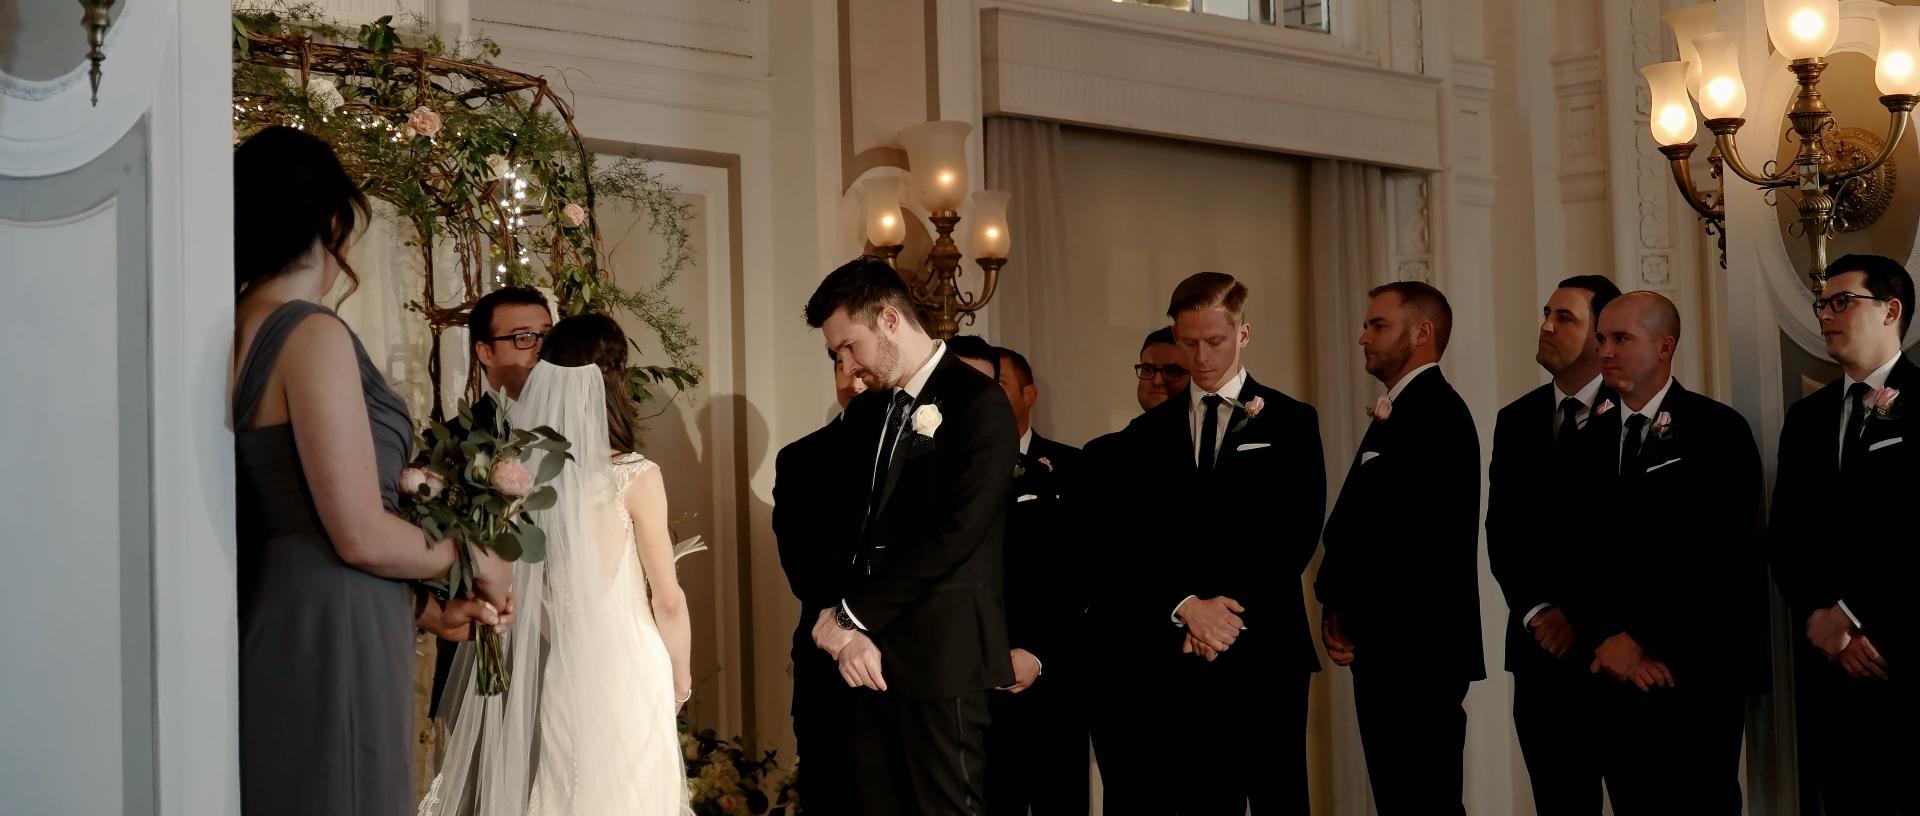 Atlanta Wedding Videographer0007.jpg